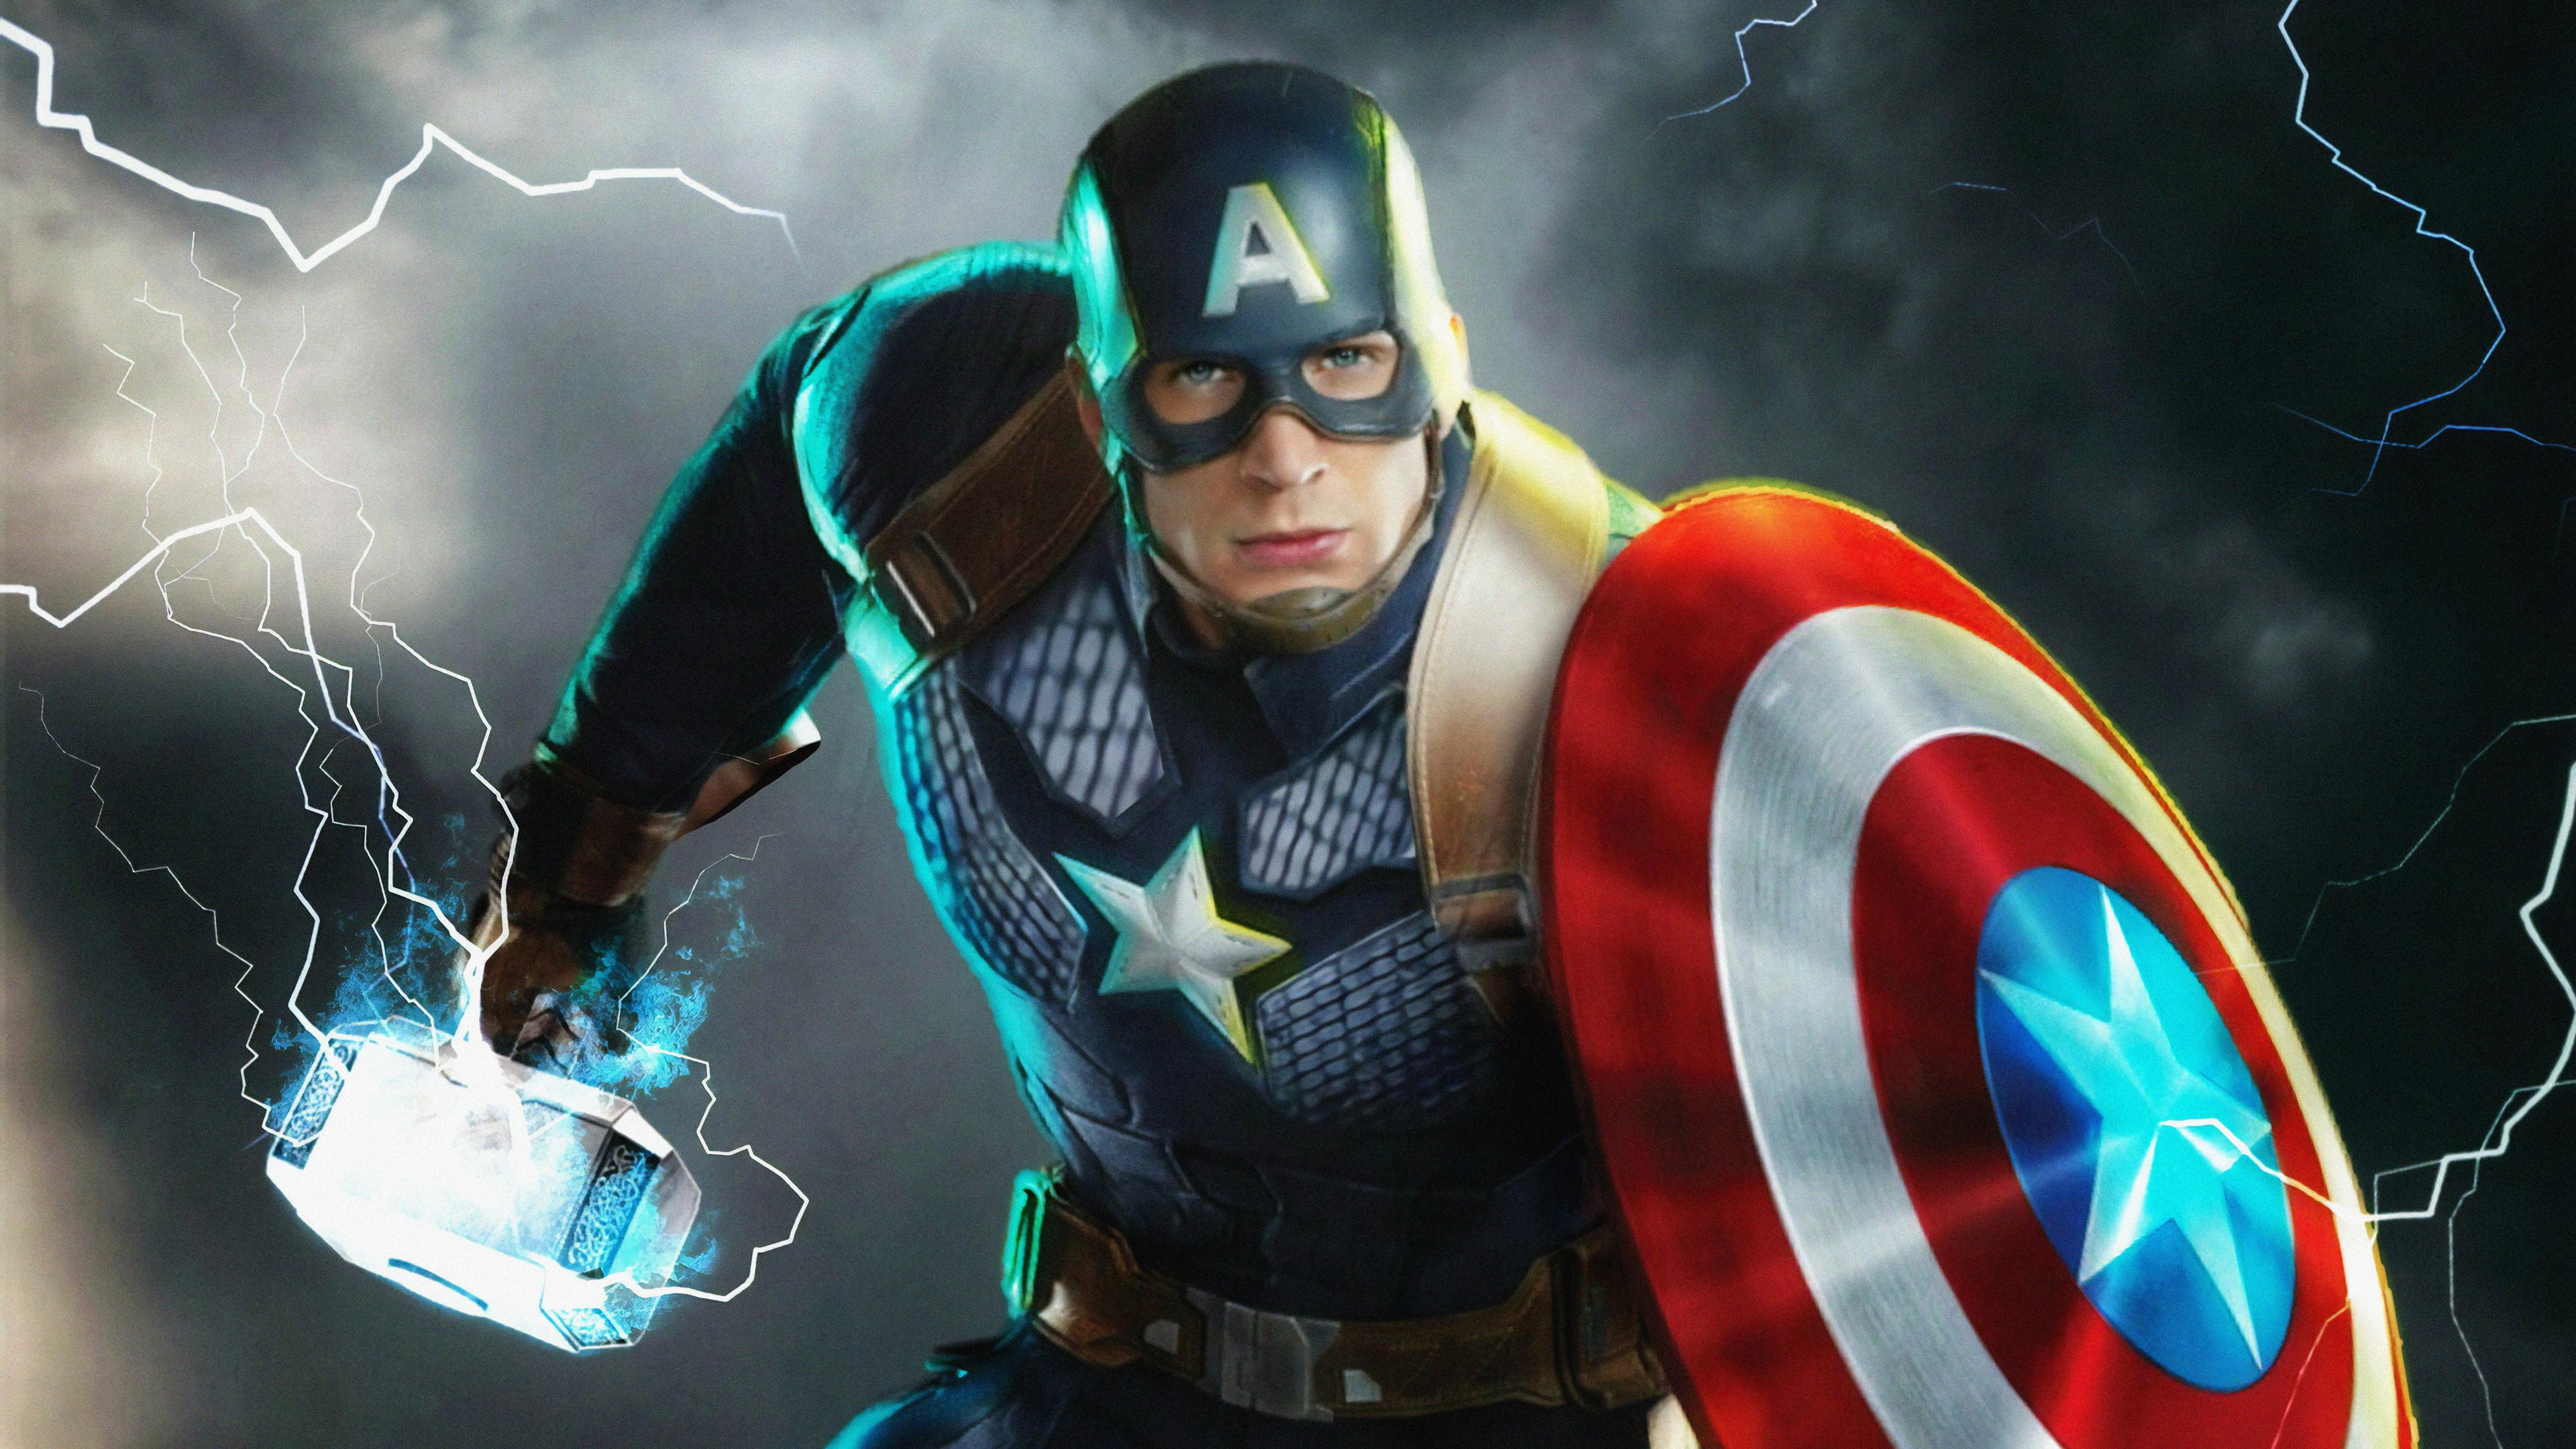 captain america new 1563220153 - Captain America New - superheroes wallpapers, hd-wallpapers, digital art wallpapers, captain america wallpapers, artwork wallpapers, 4k-wallpapers